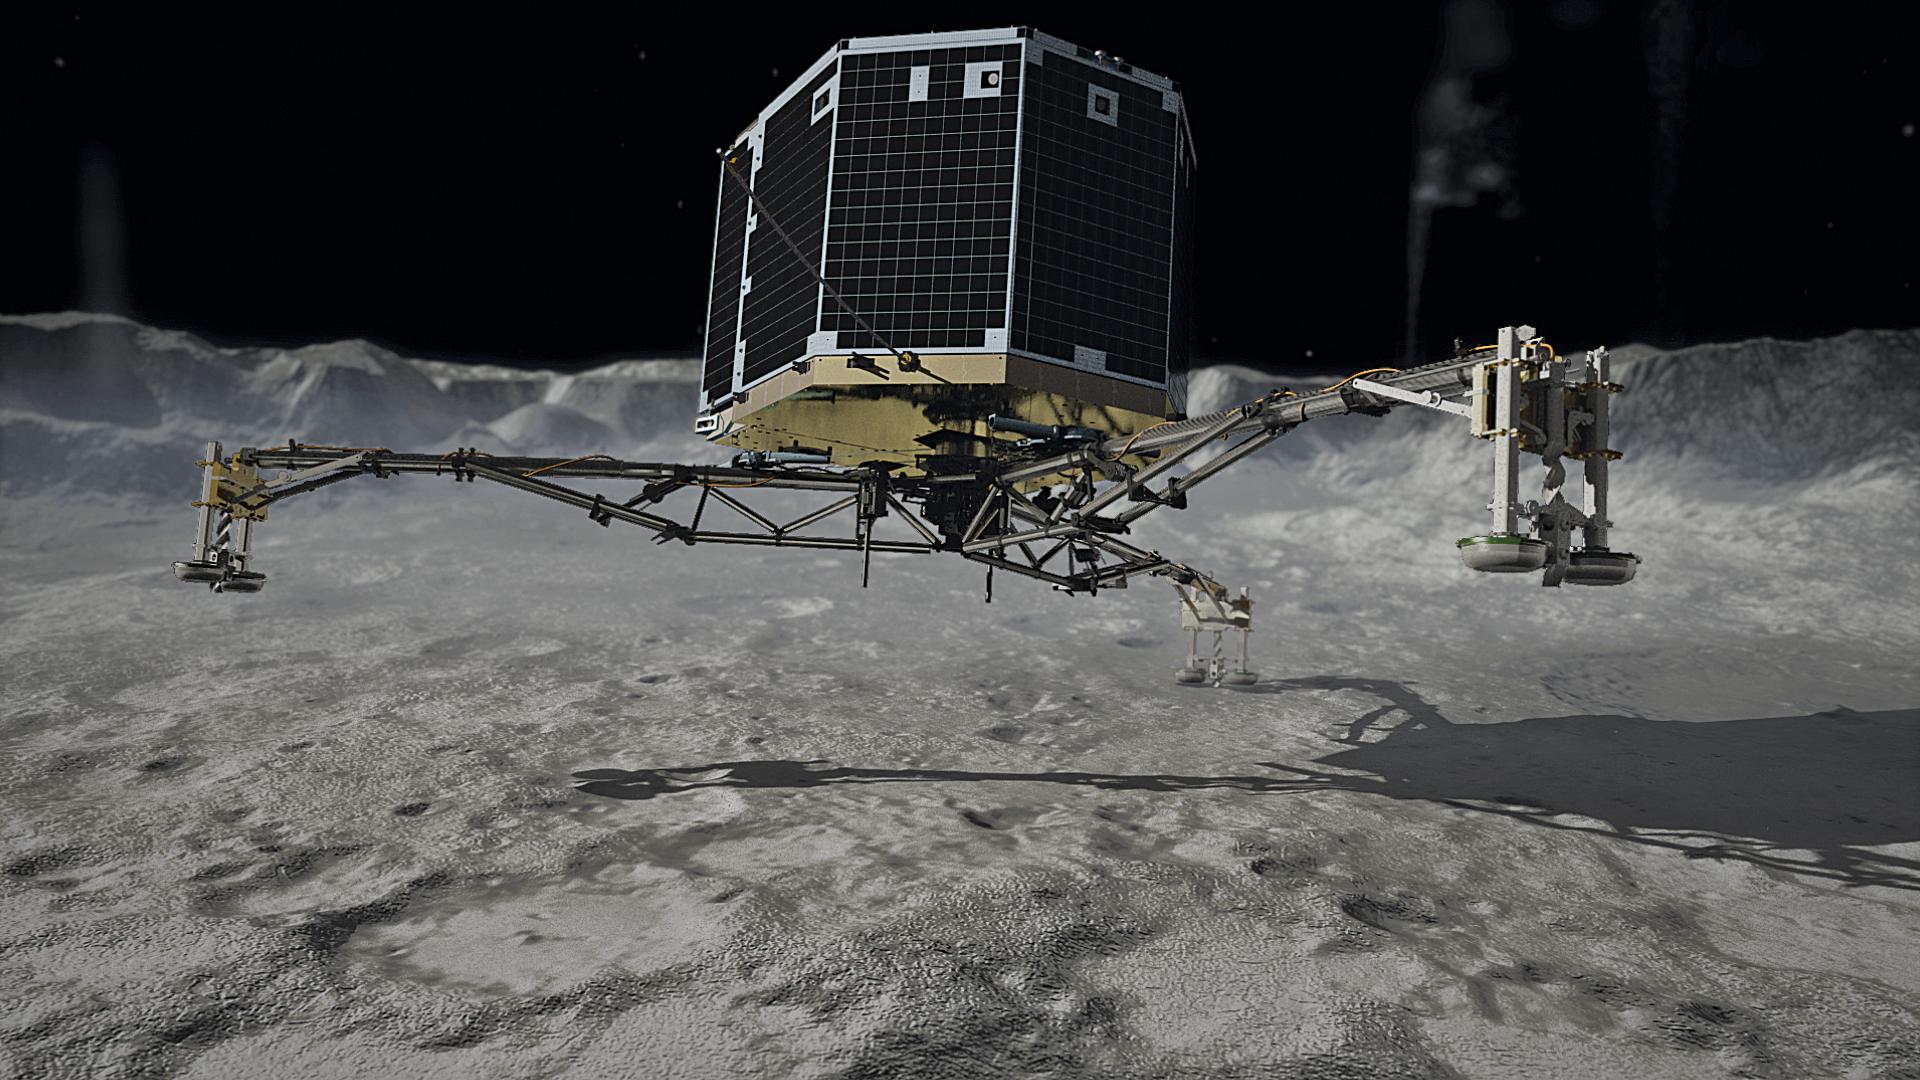 Renaming the comet lander